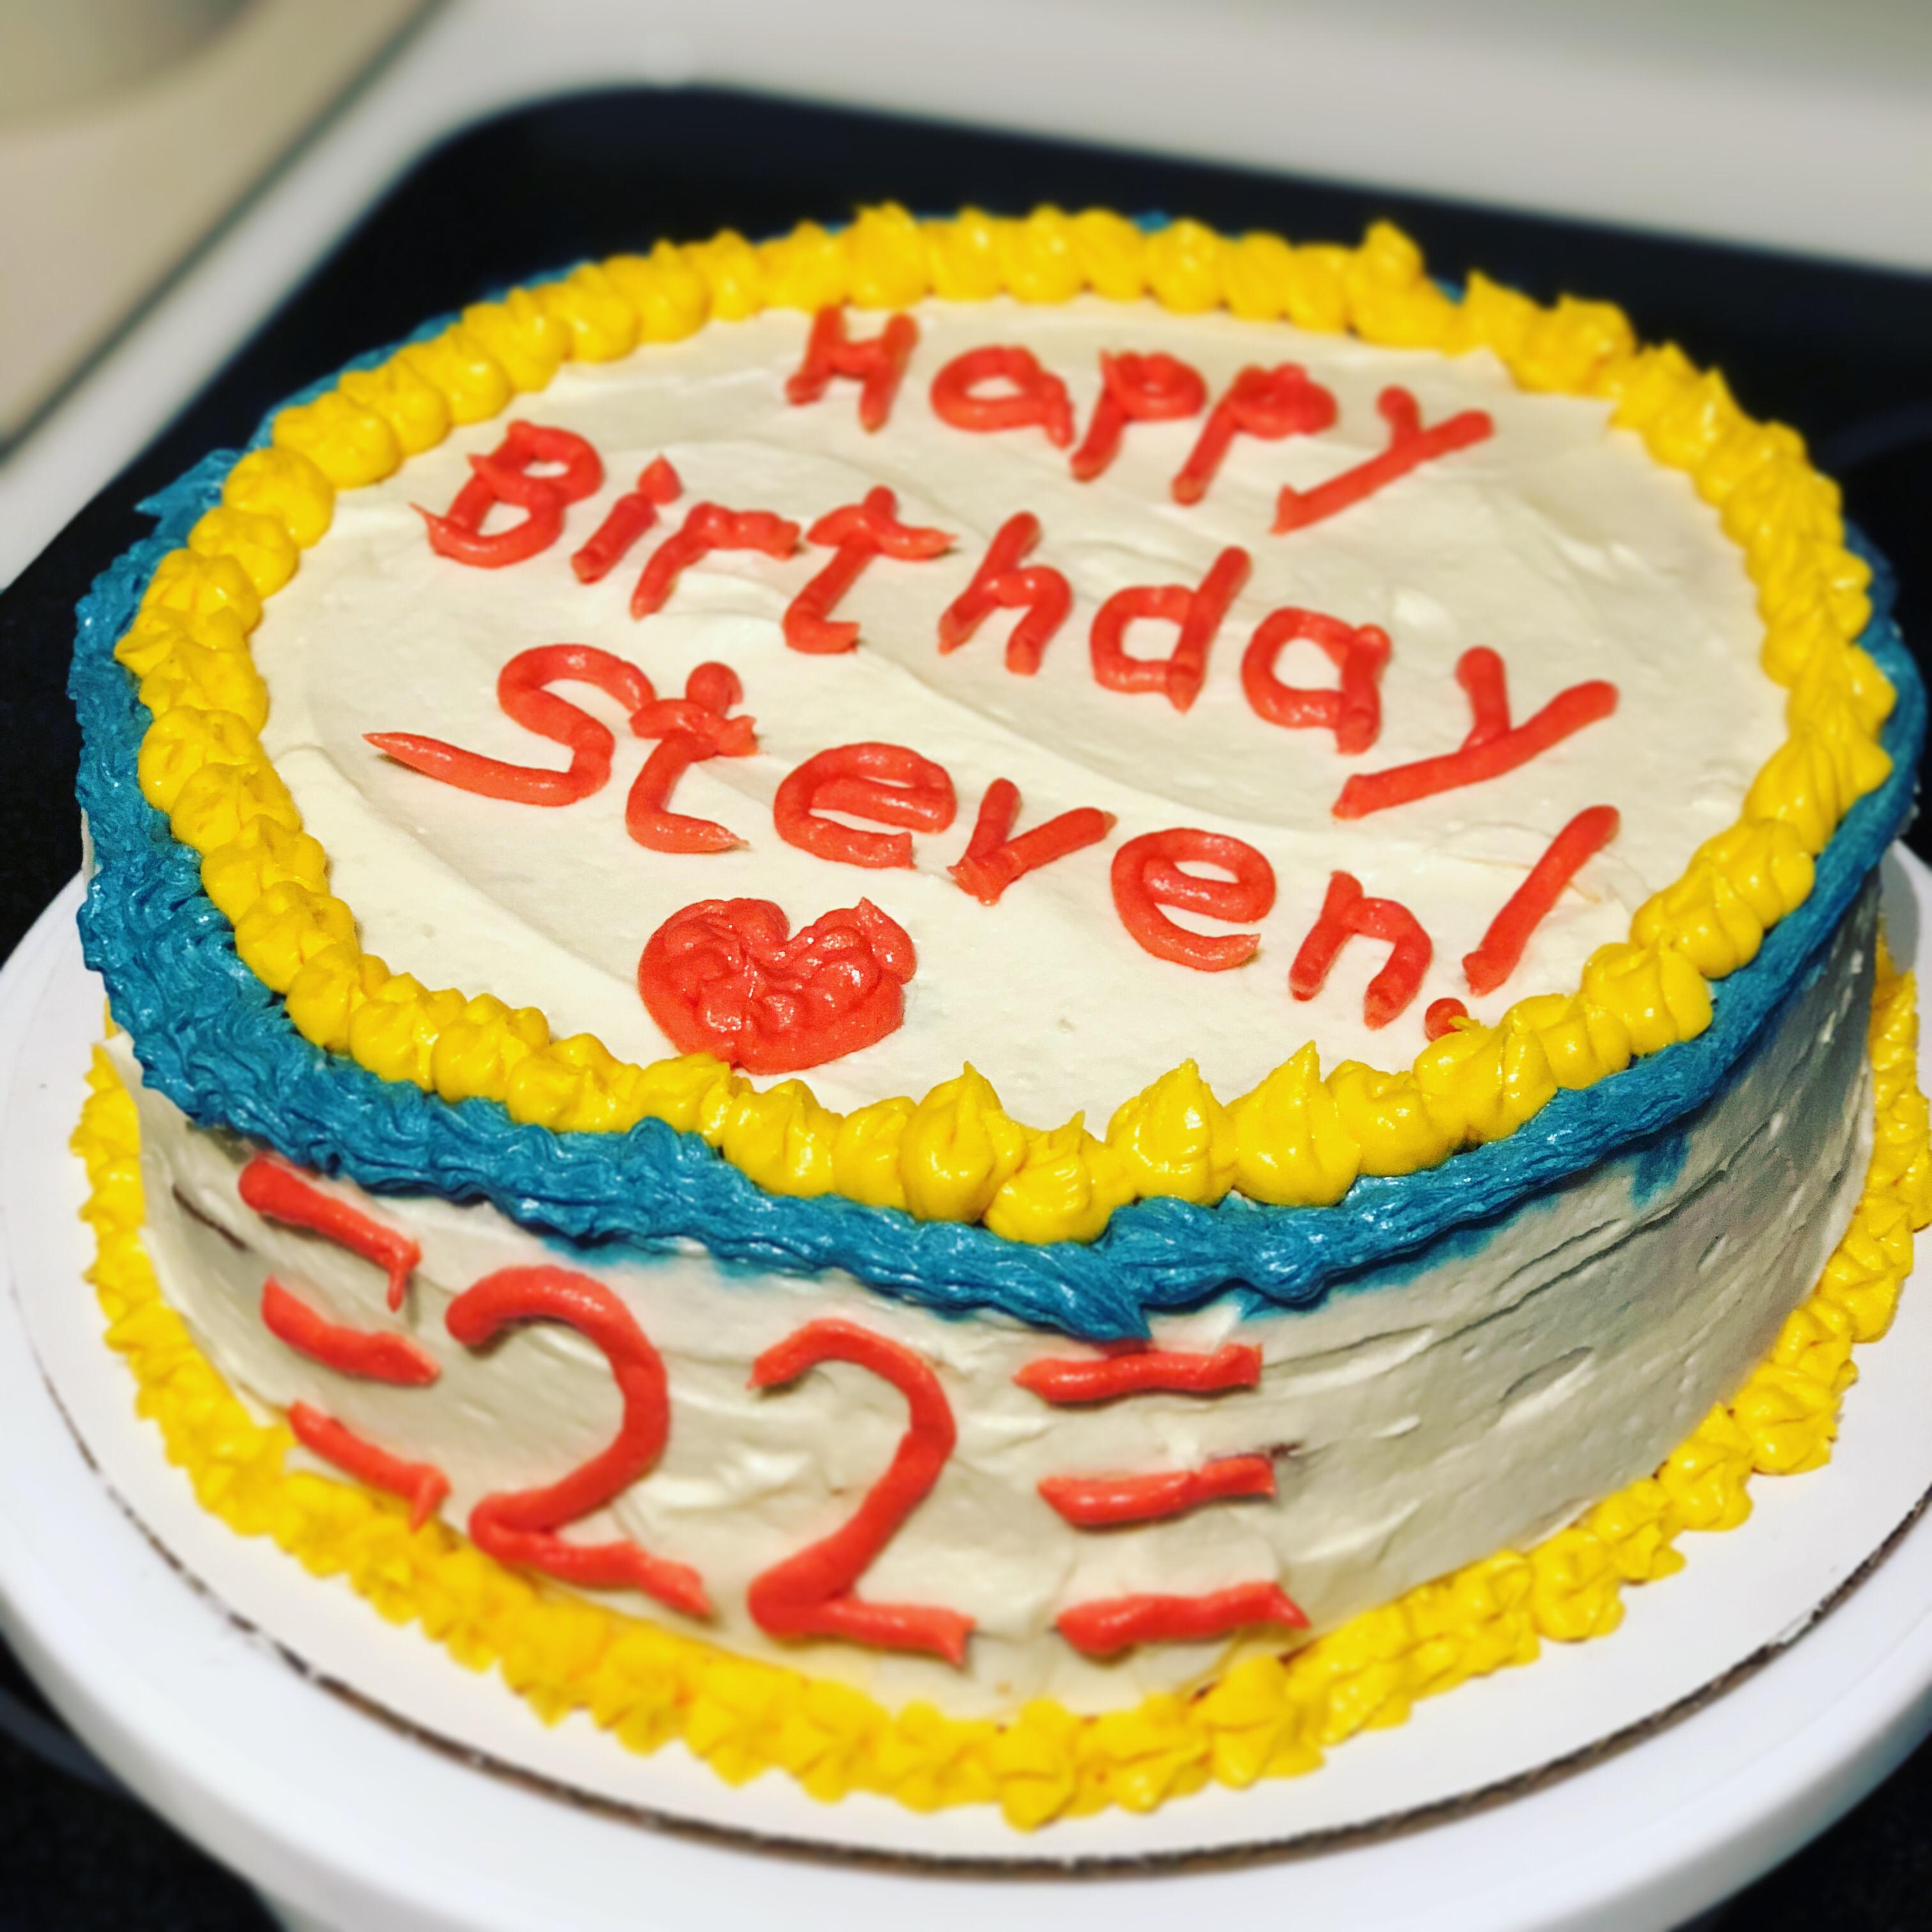 Happy Birthday Cake Brian Michael Schade